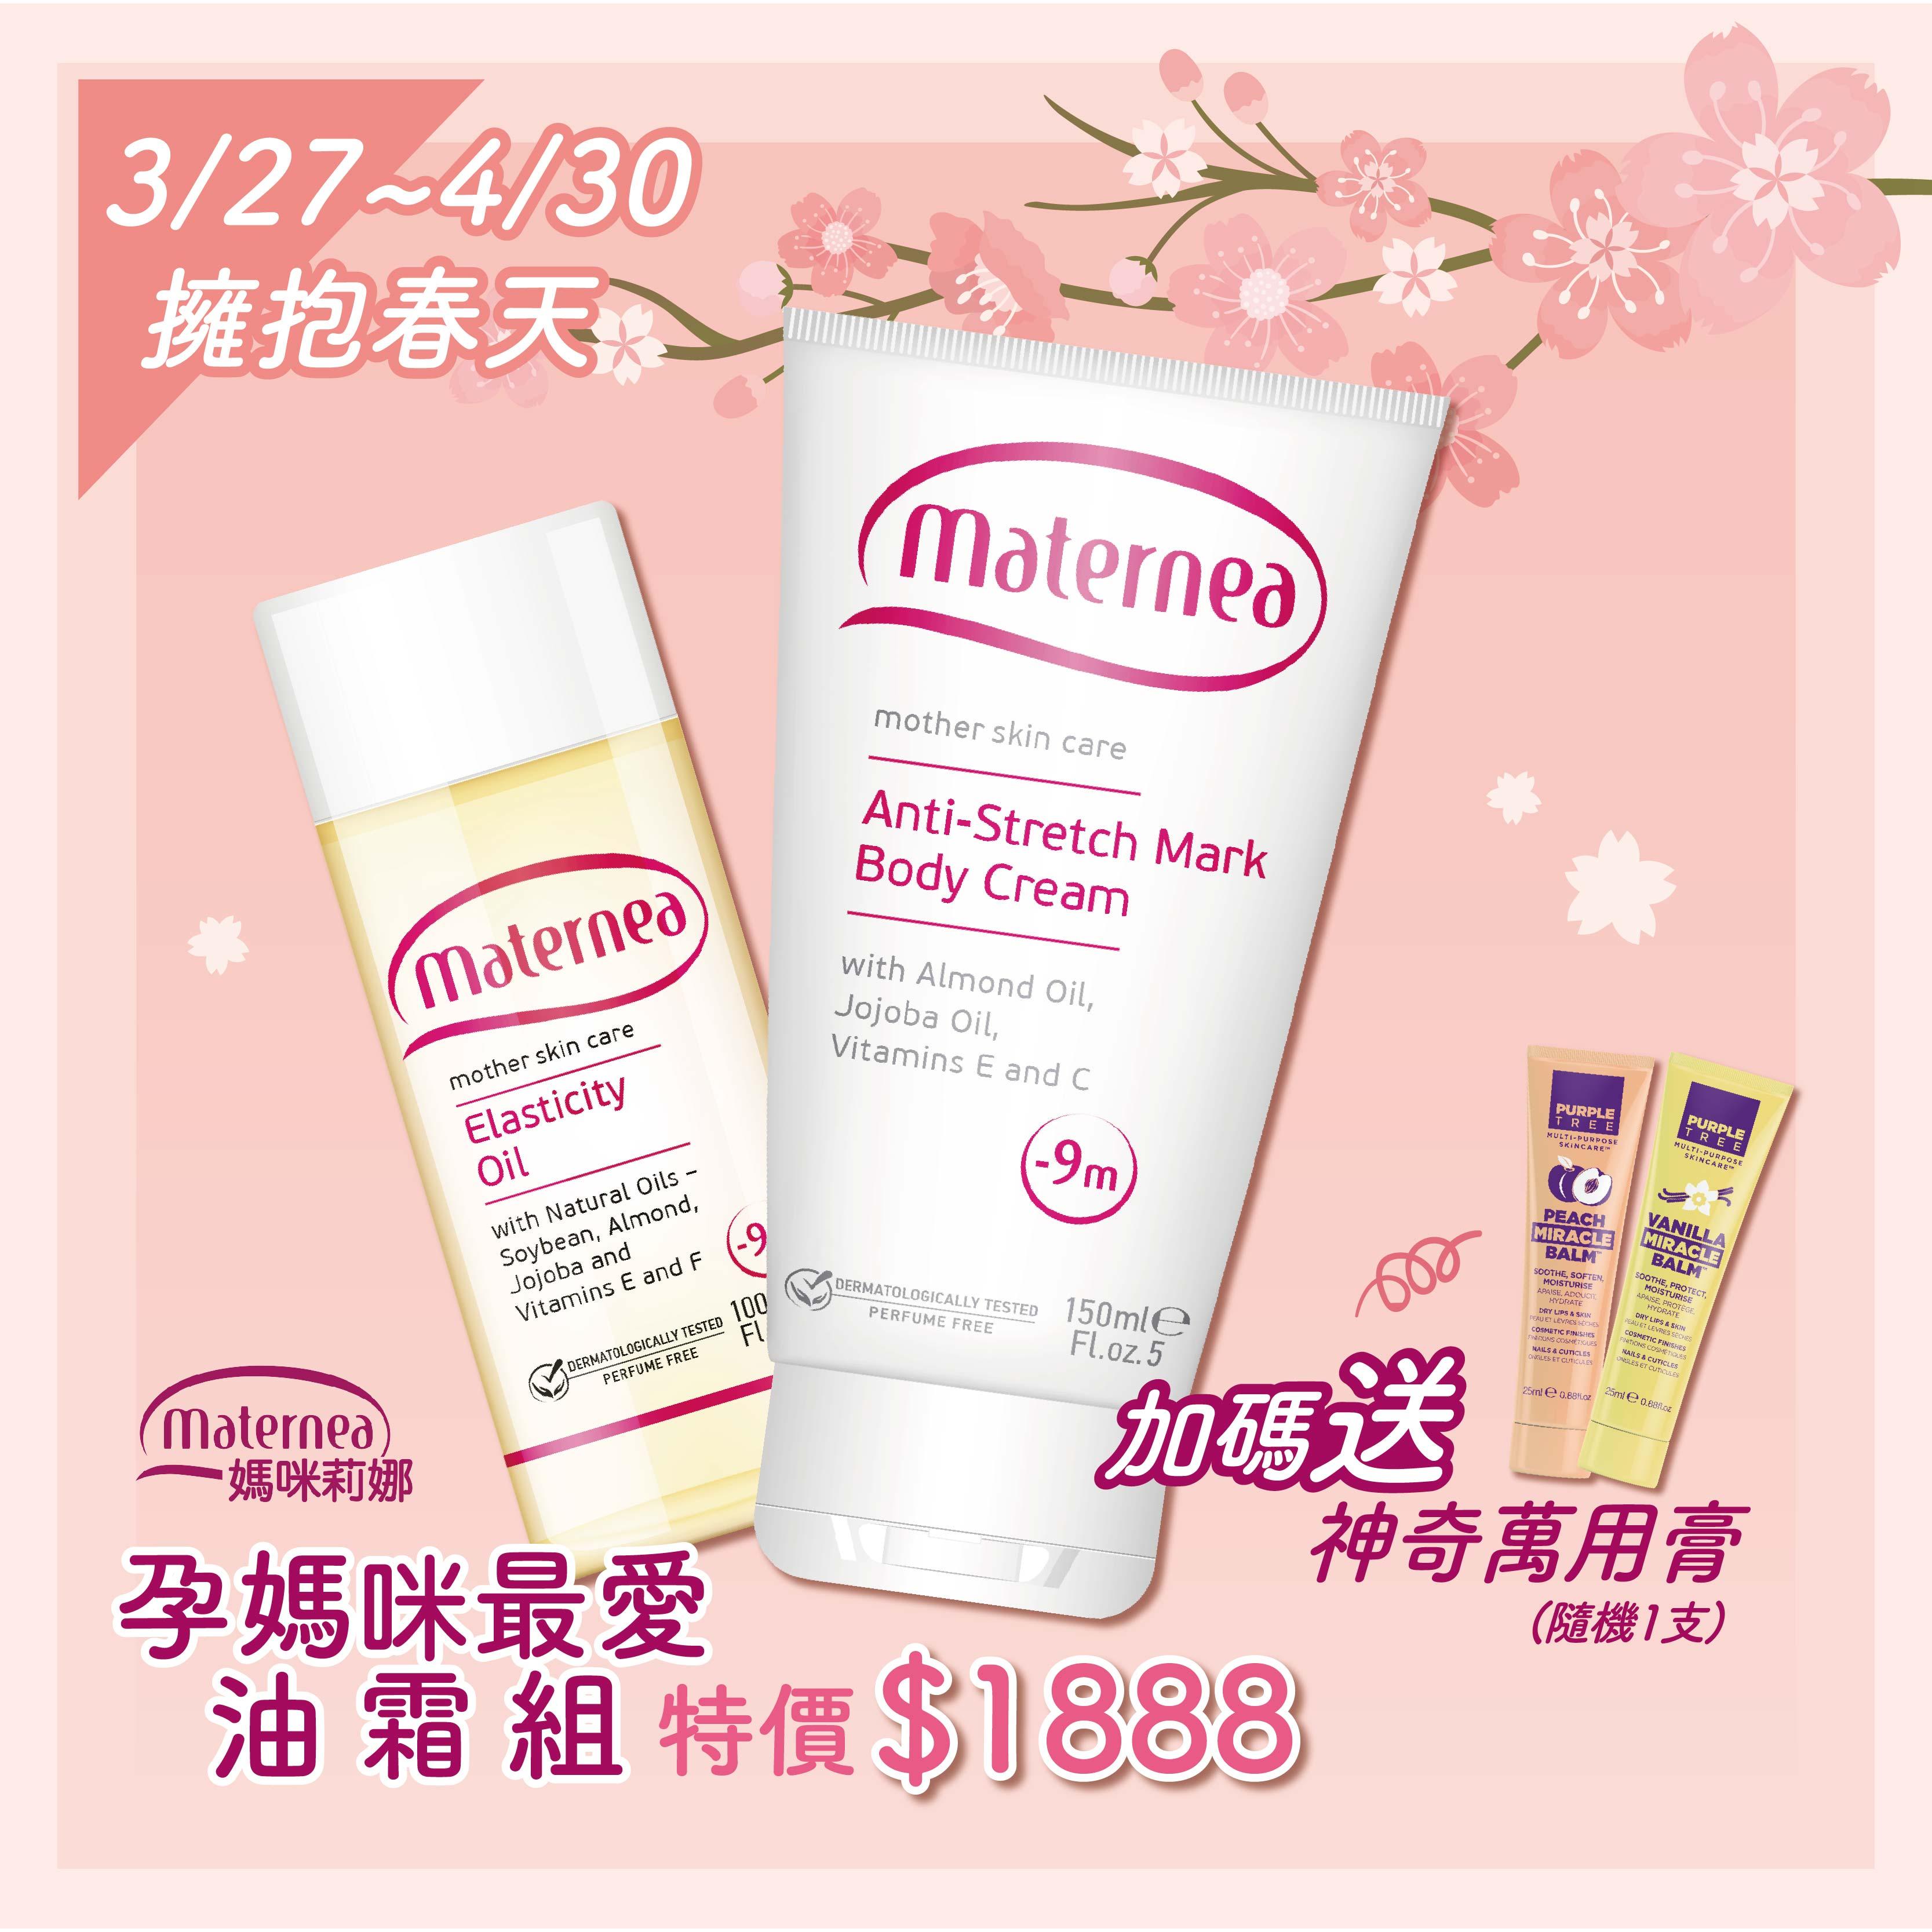 maternea媽咪莉娜【無痕美體霜150ml+彈力潤膚油100ml+神奇萬用膏】